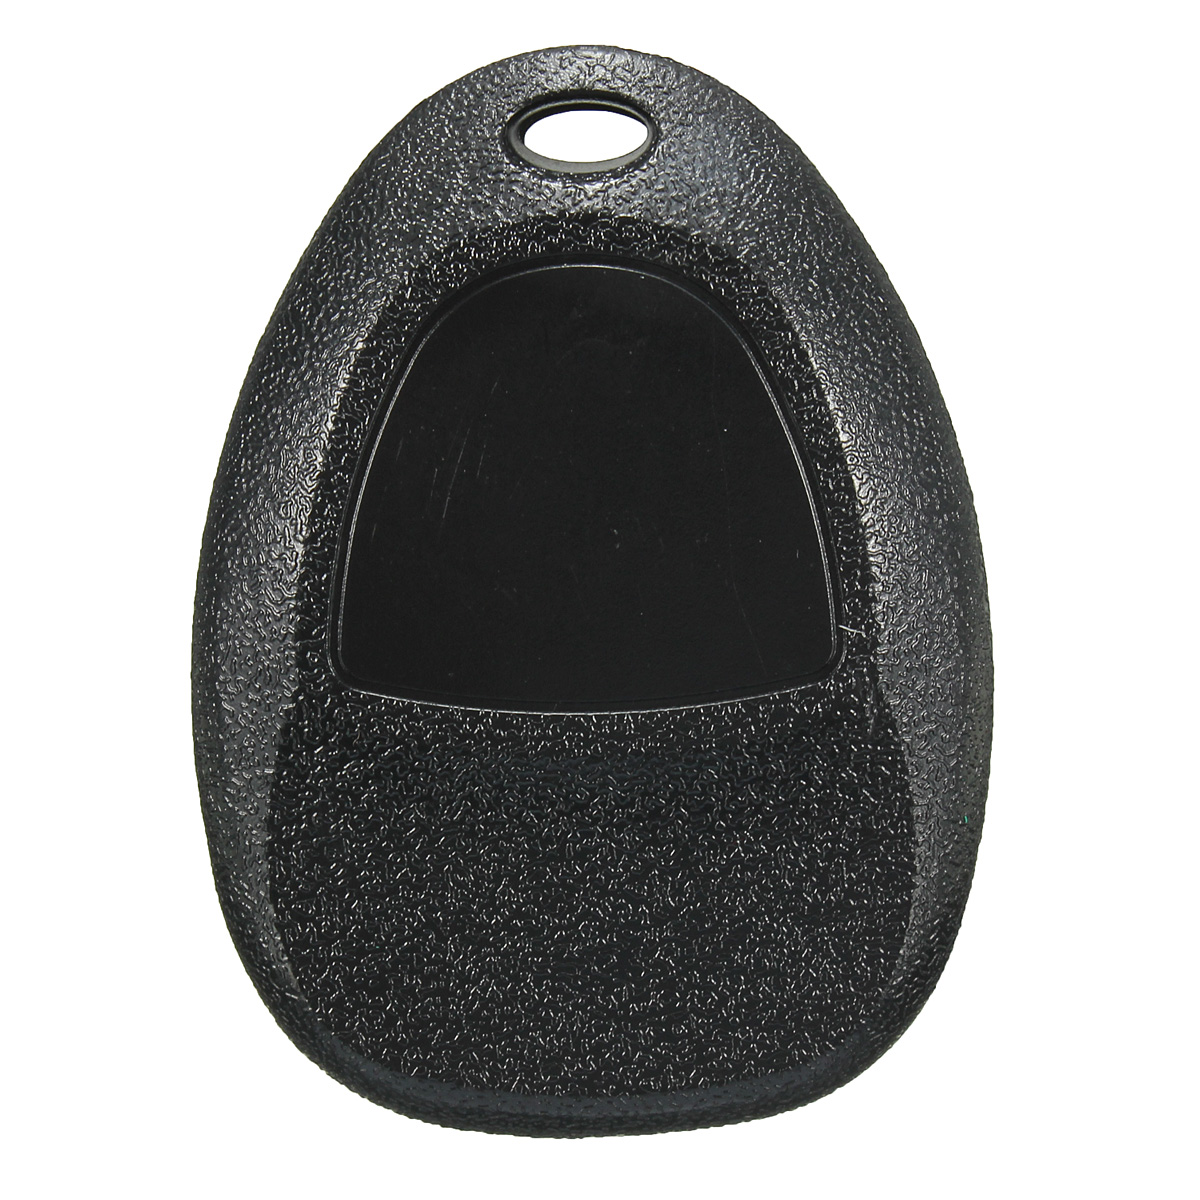 2014 nissan altima remote keyless entry key fob remote autos post. Black Bedroom Furniture Sets. Home Design Ideas